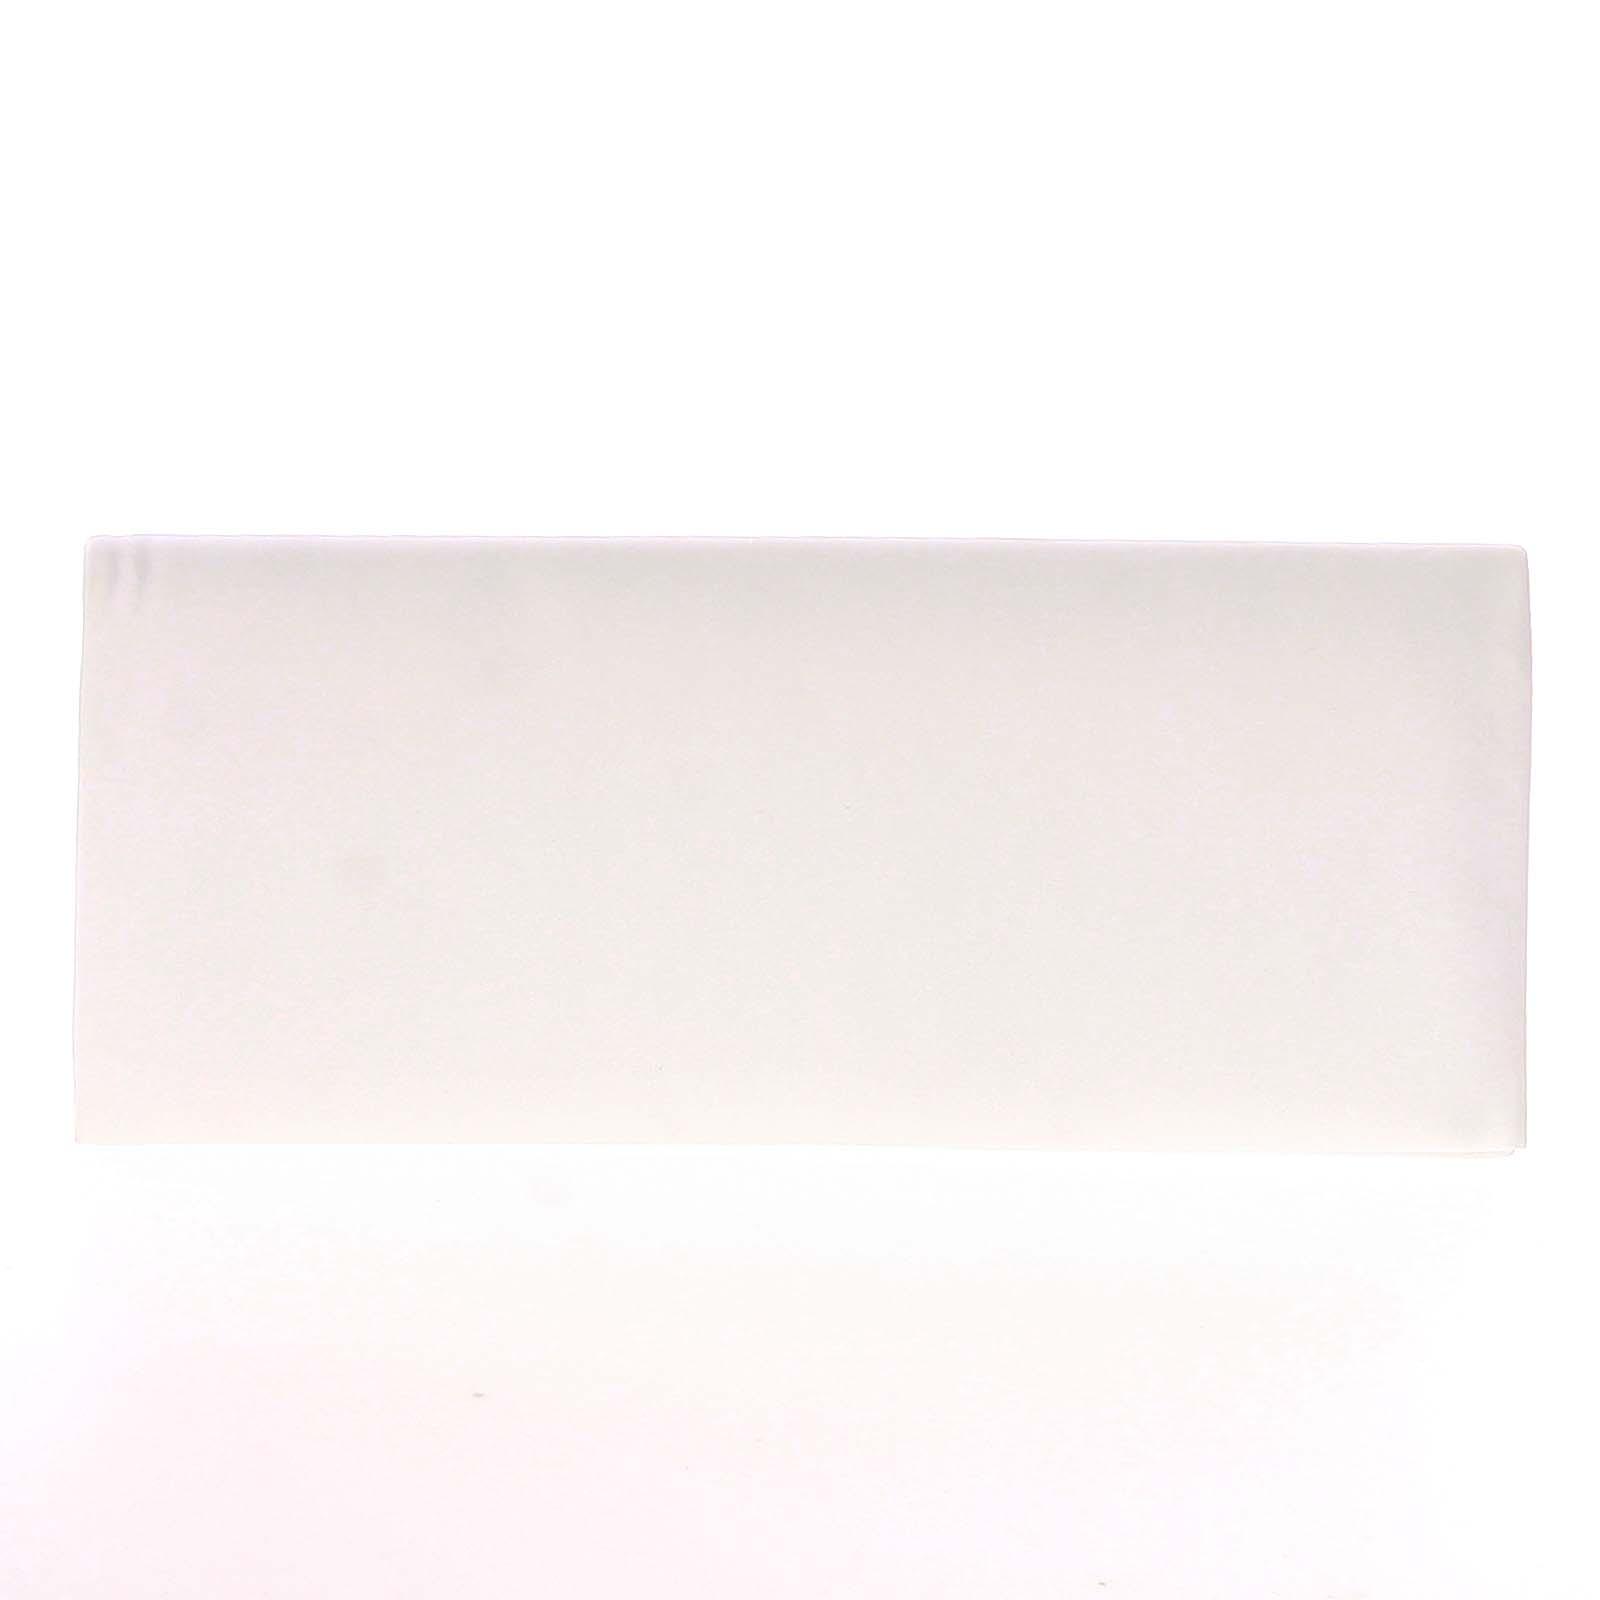 Decentná saténová listová kabelka biela - Delami P355